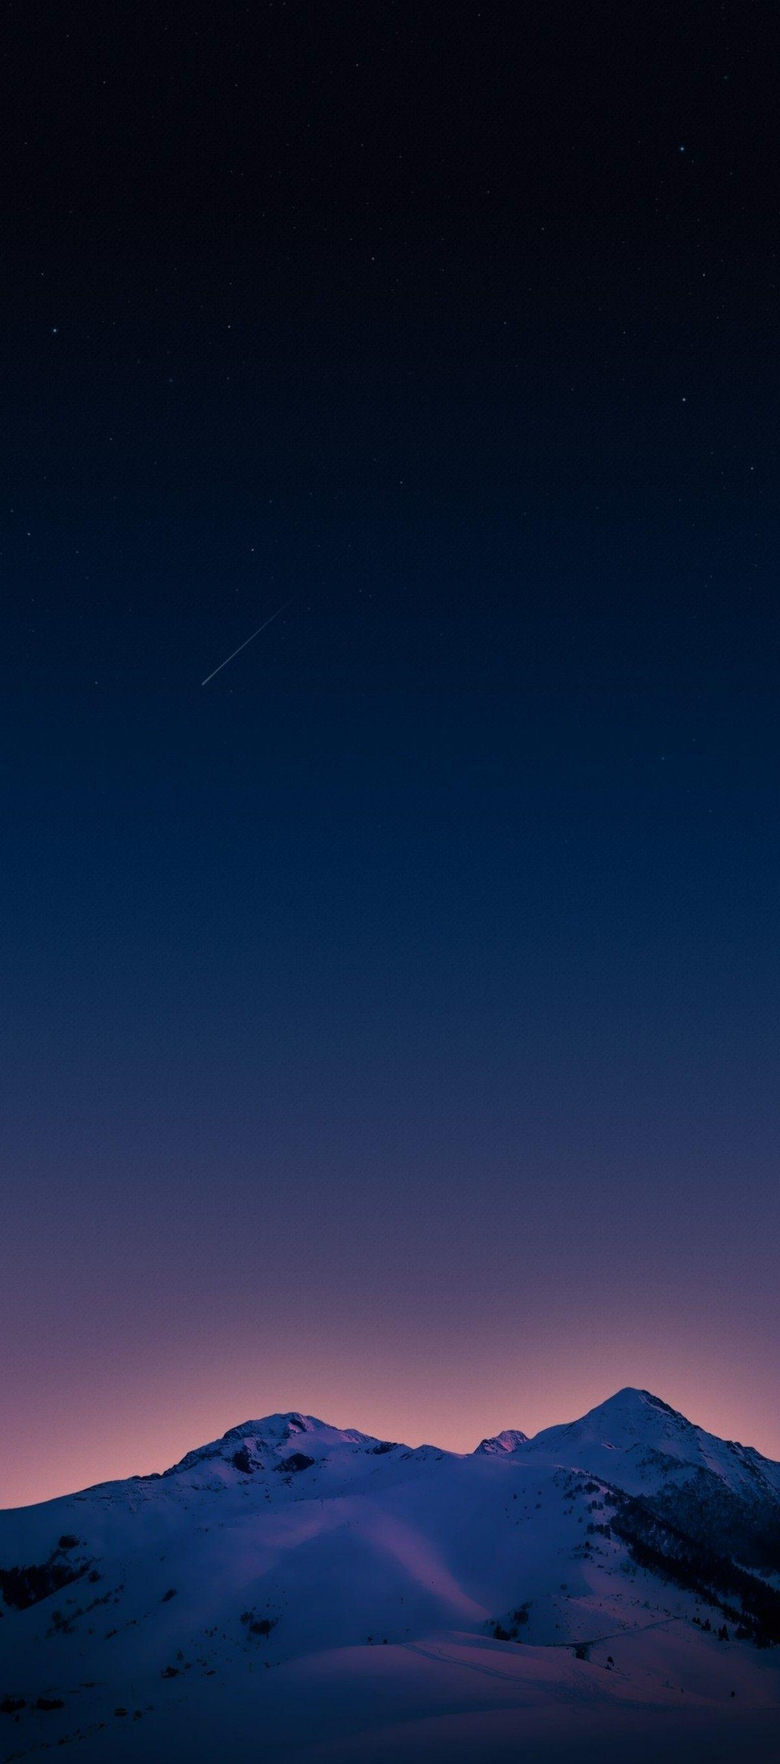 iPhone x iPhone 8 ios Pixel 2 xl mountain sunset purple